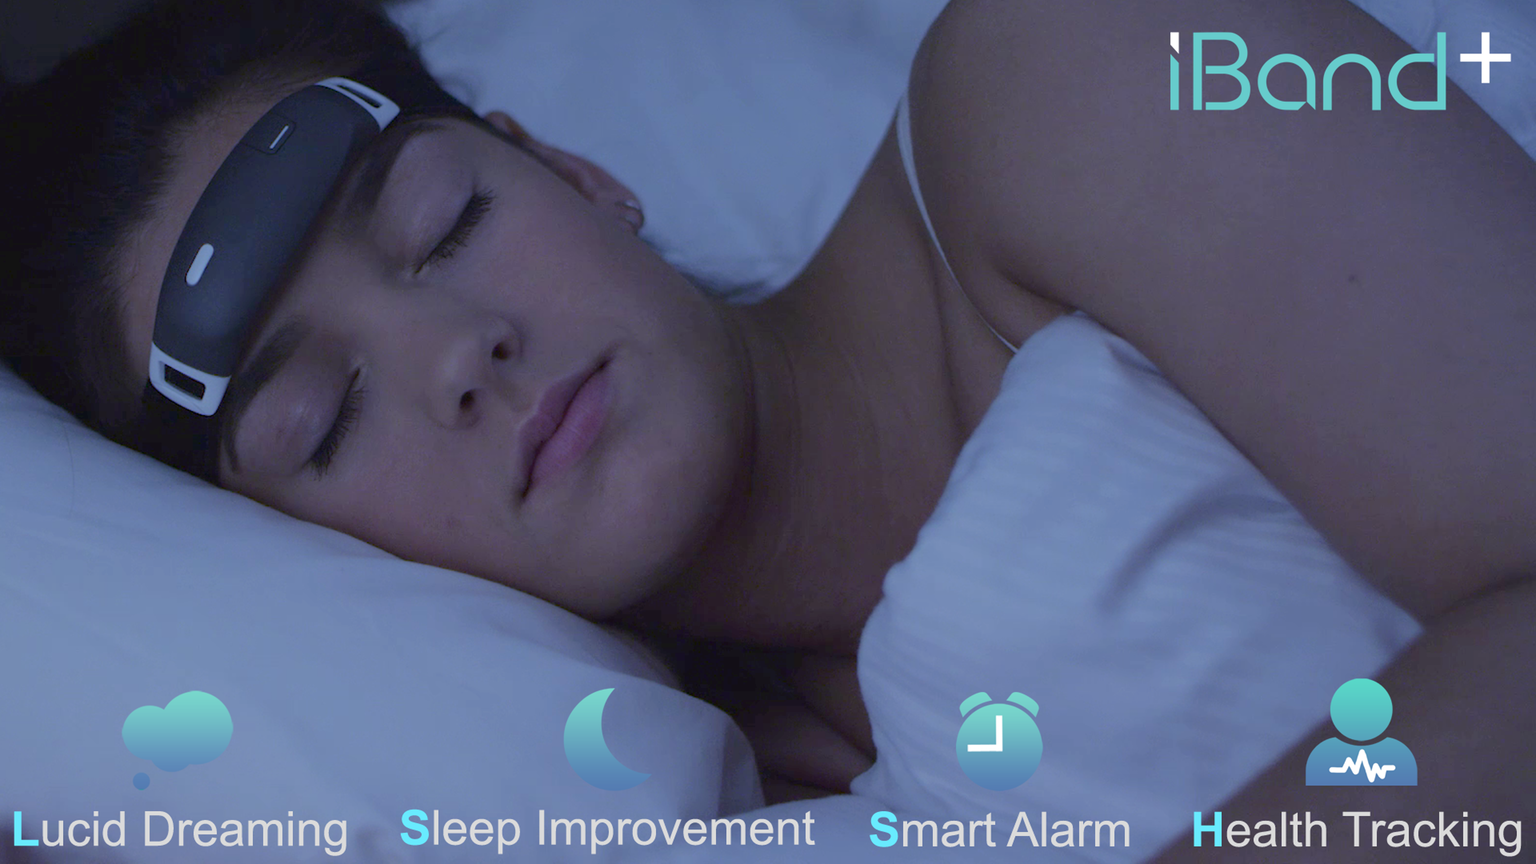 iband iband+ ibandplus improve sleep patterns and induce lucid dreams